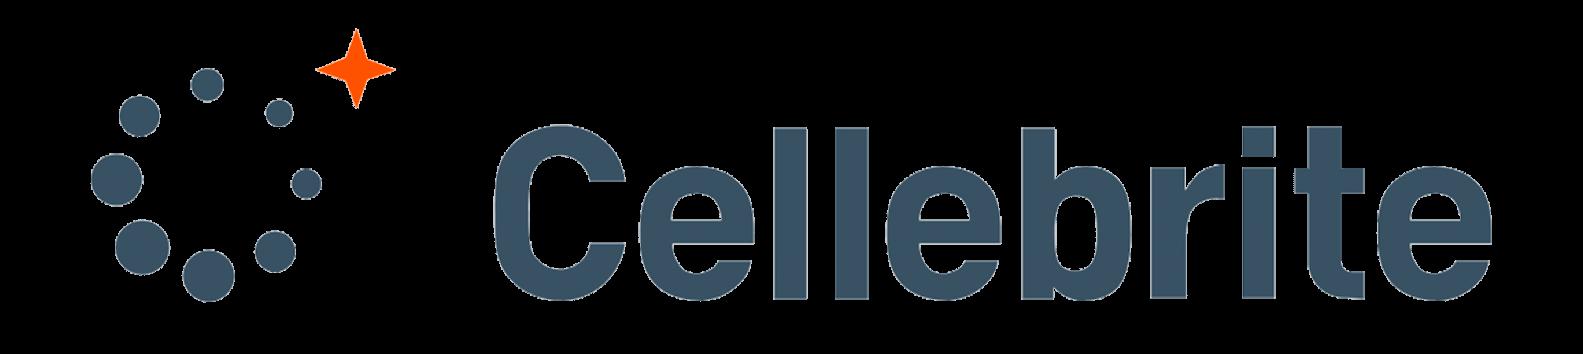 cellebrite logo2